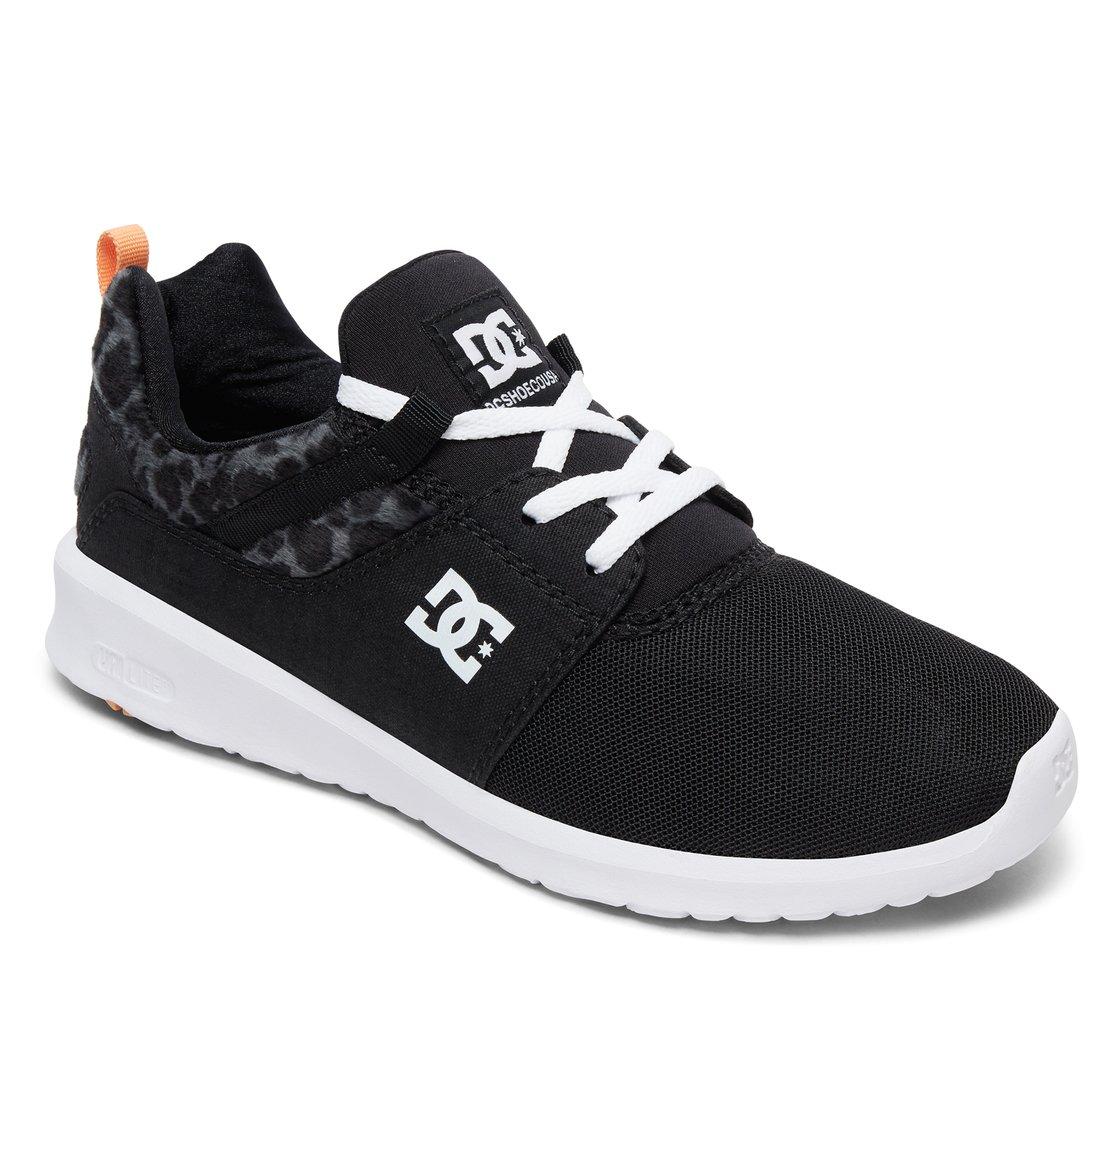 DC-Shoes-Heathrow-TX-SE-Schuhe-fuer-Frauen-ADJS700025